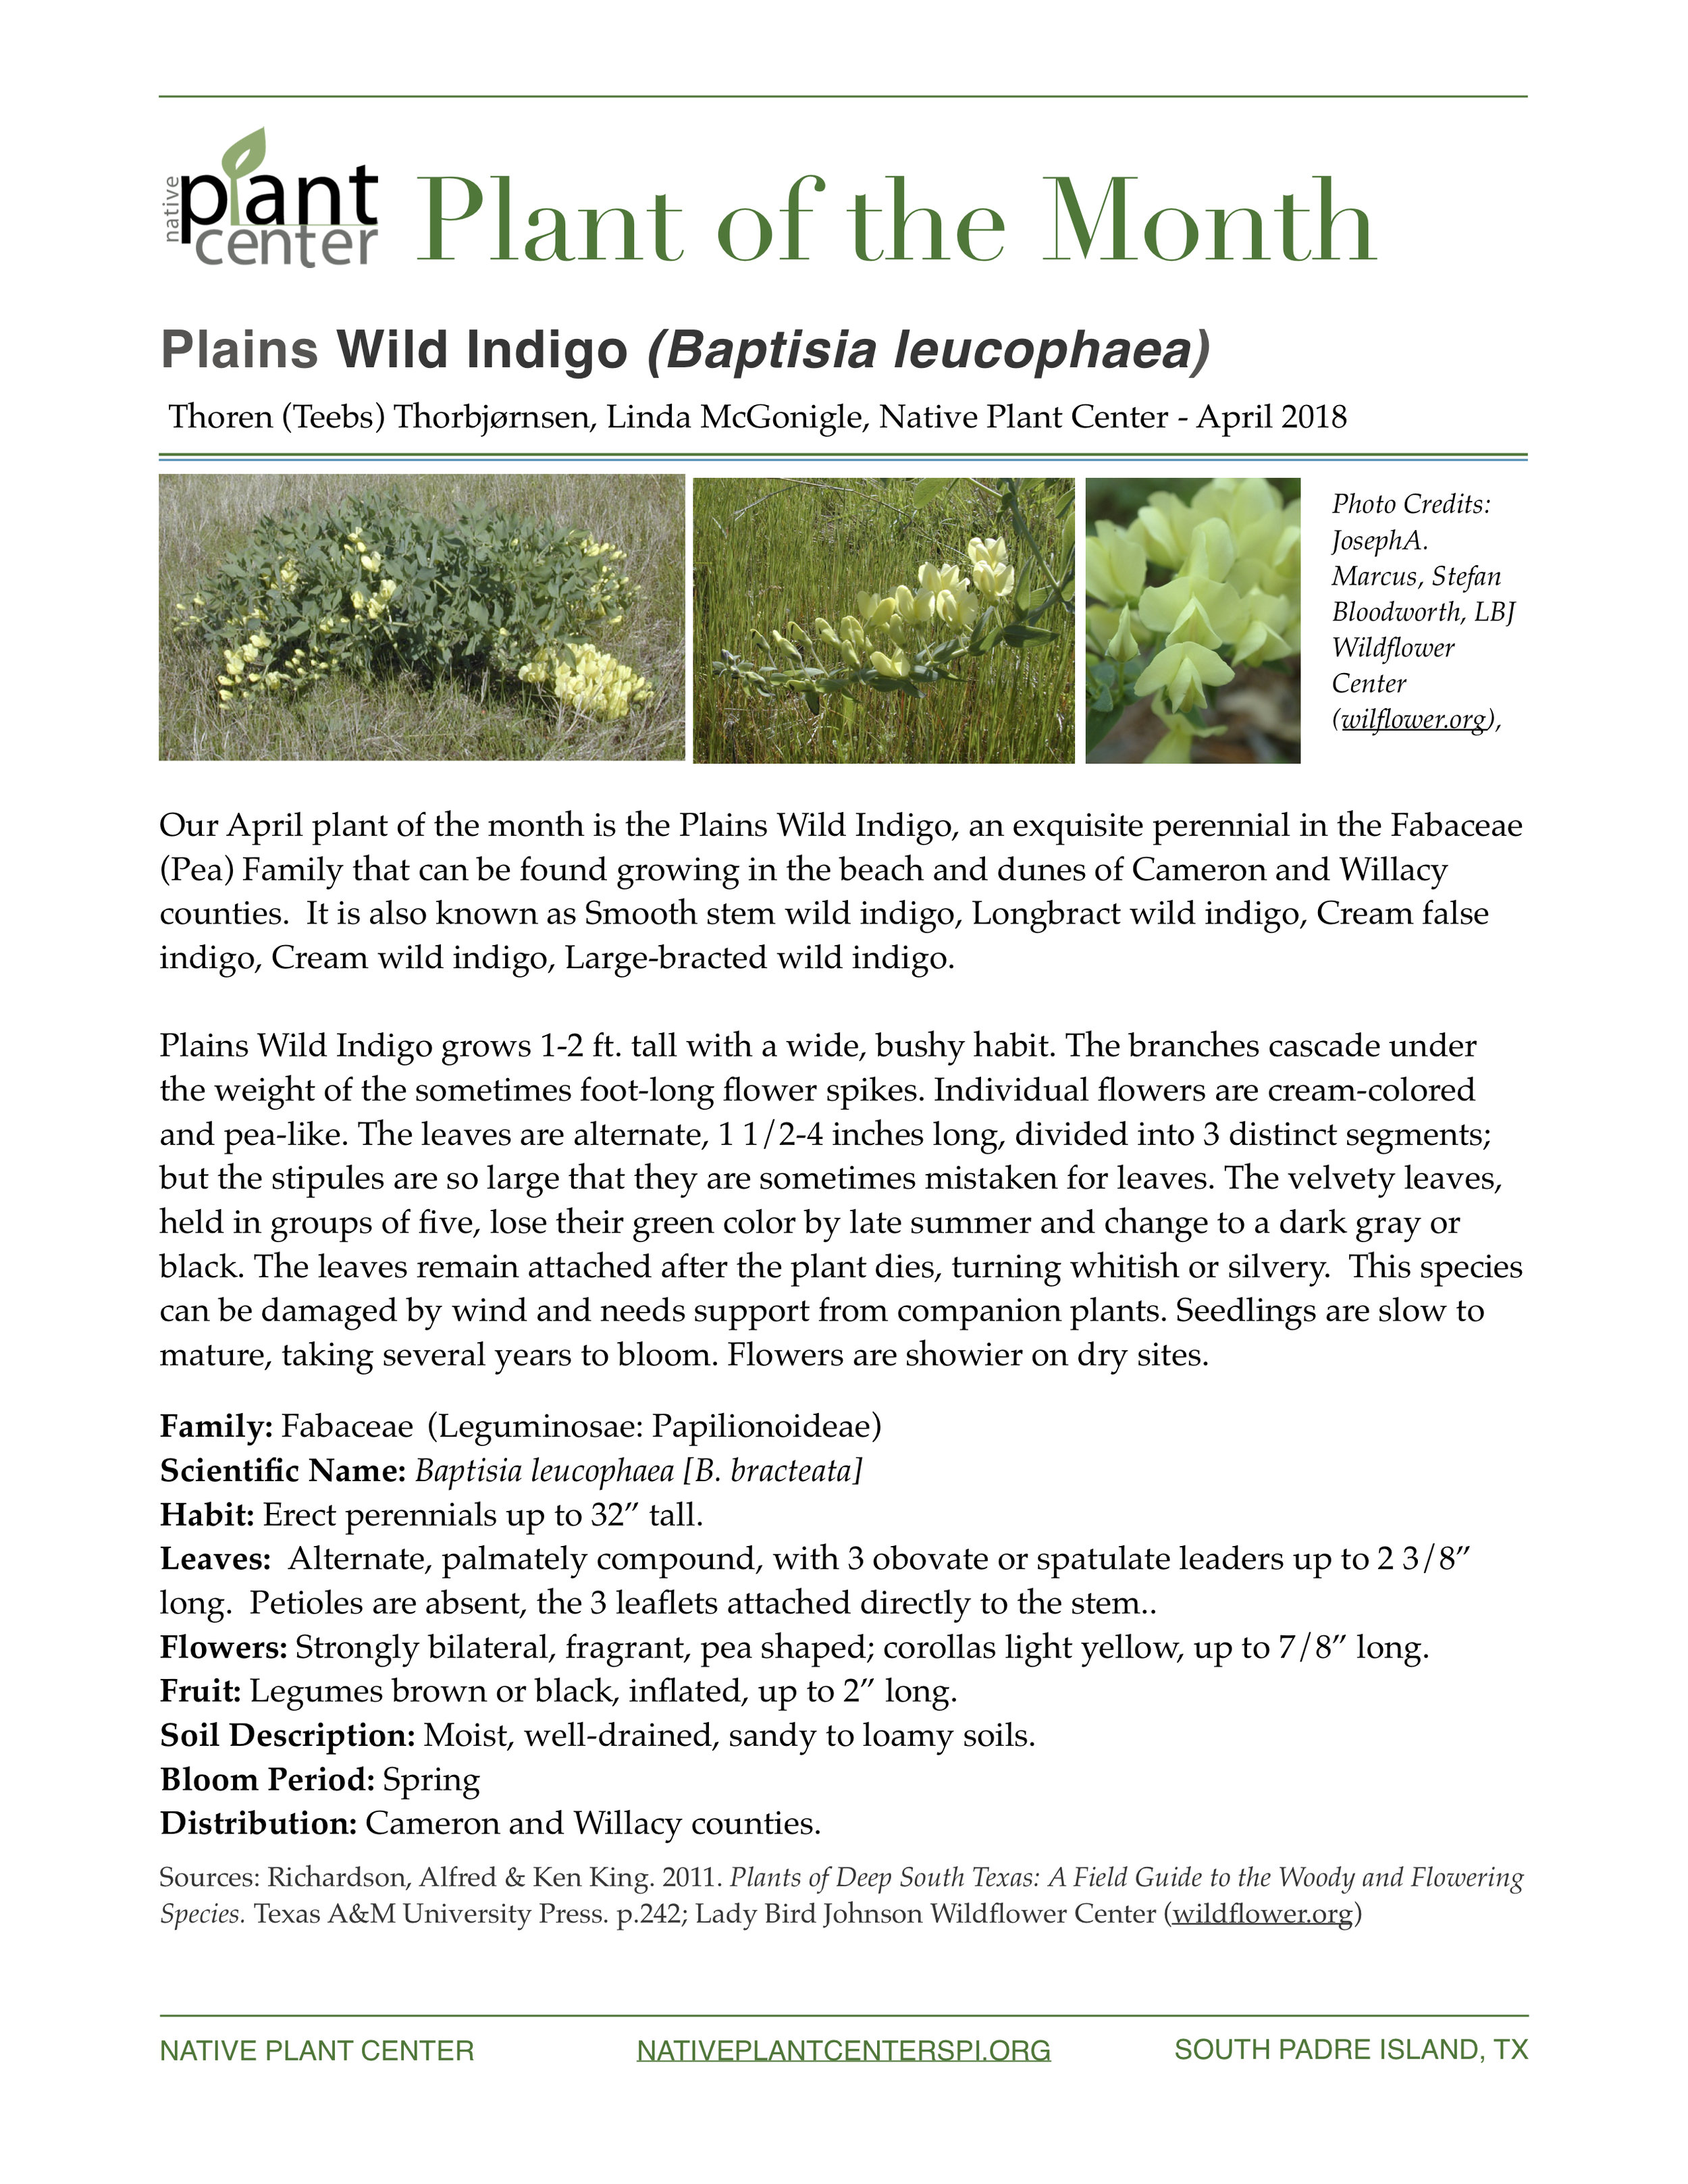 NPC Plant of the Month 4.2018.jpg